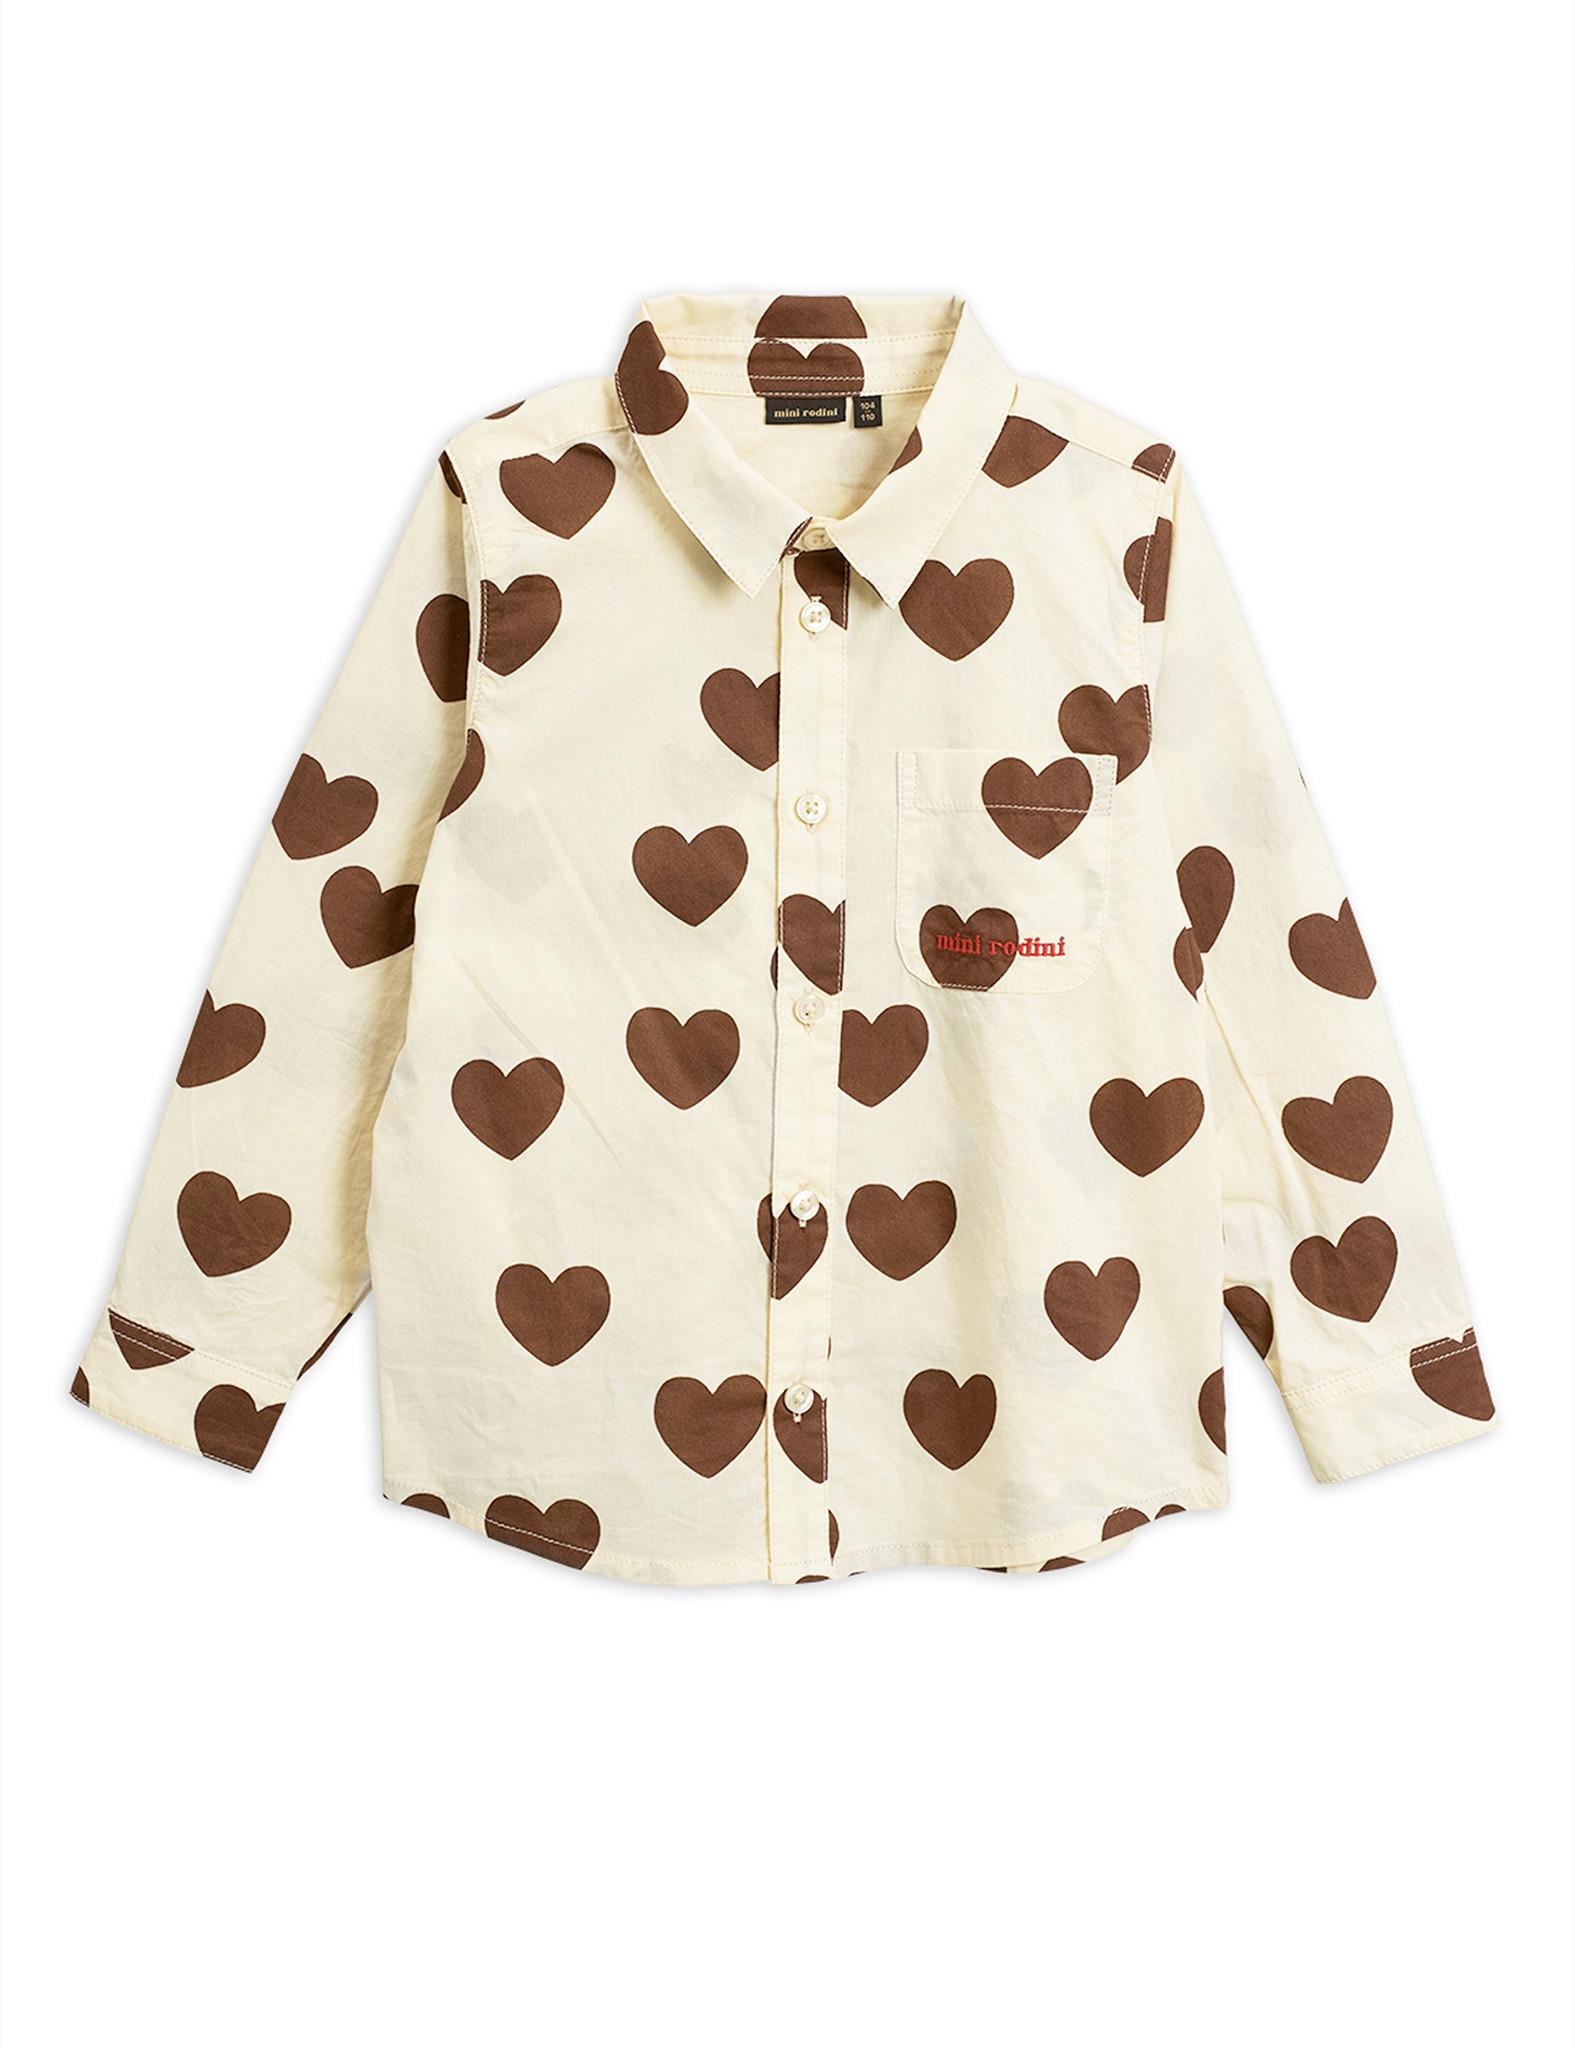 Hearts woven shirt - Offwhite-1